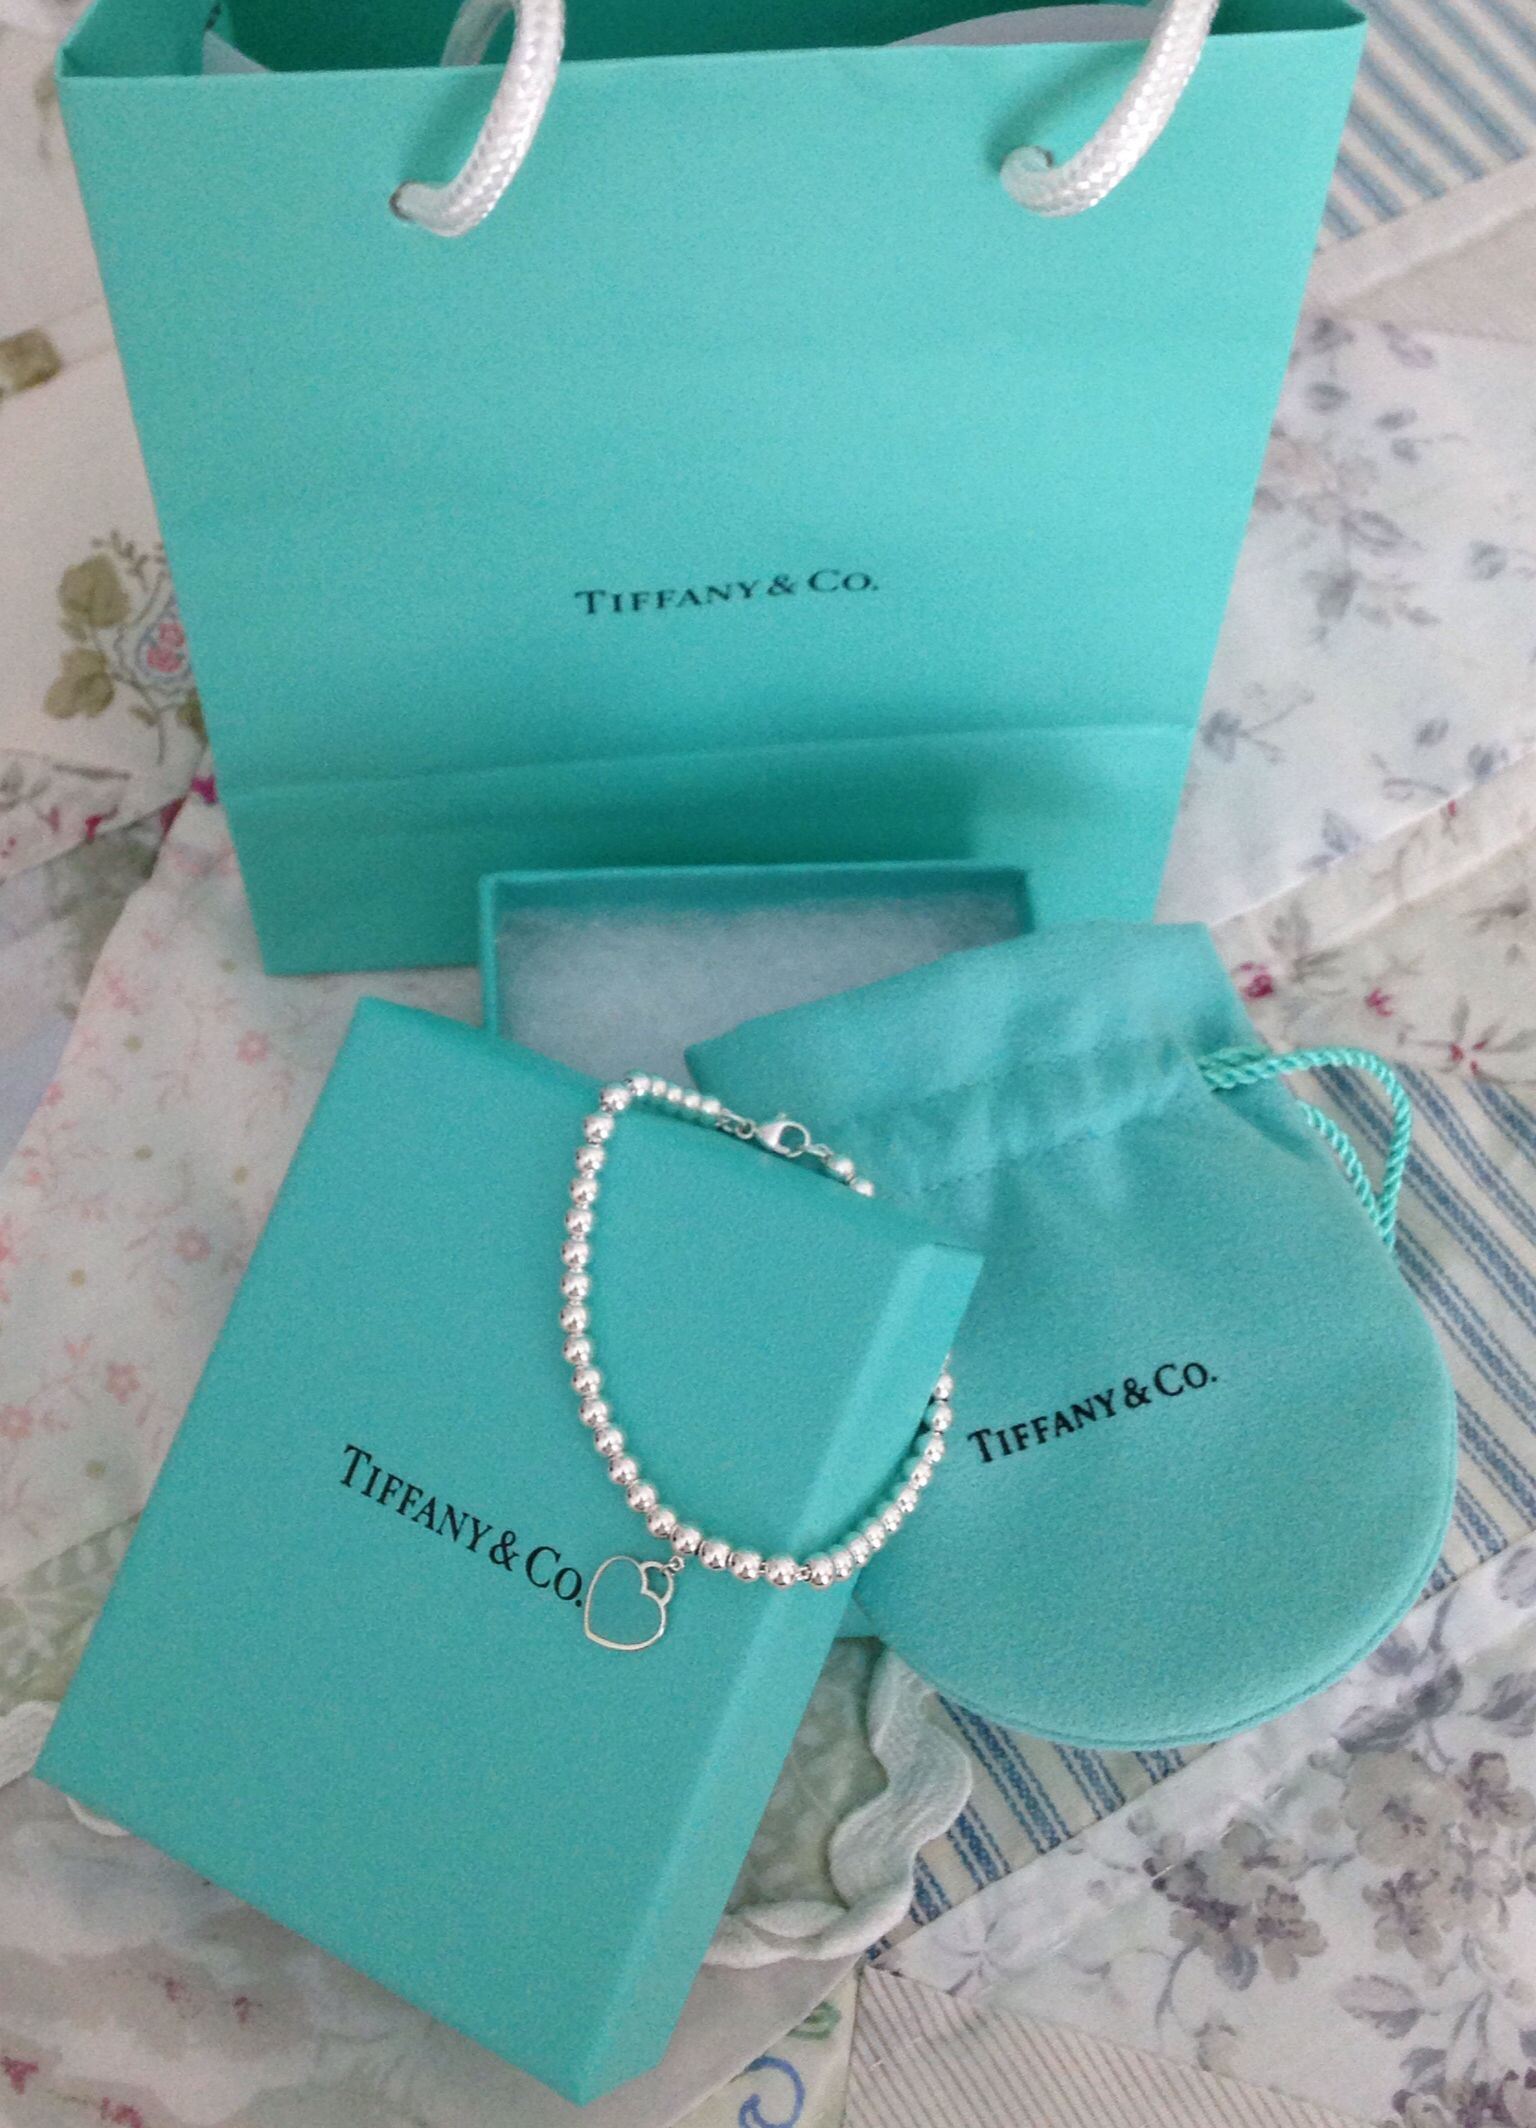 My first Tiffany's bracelet from my BFF